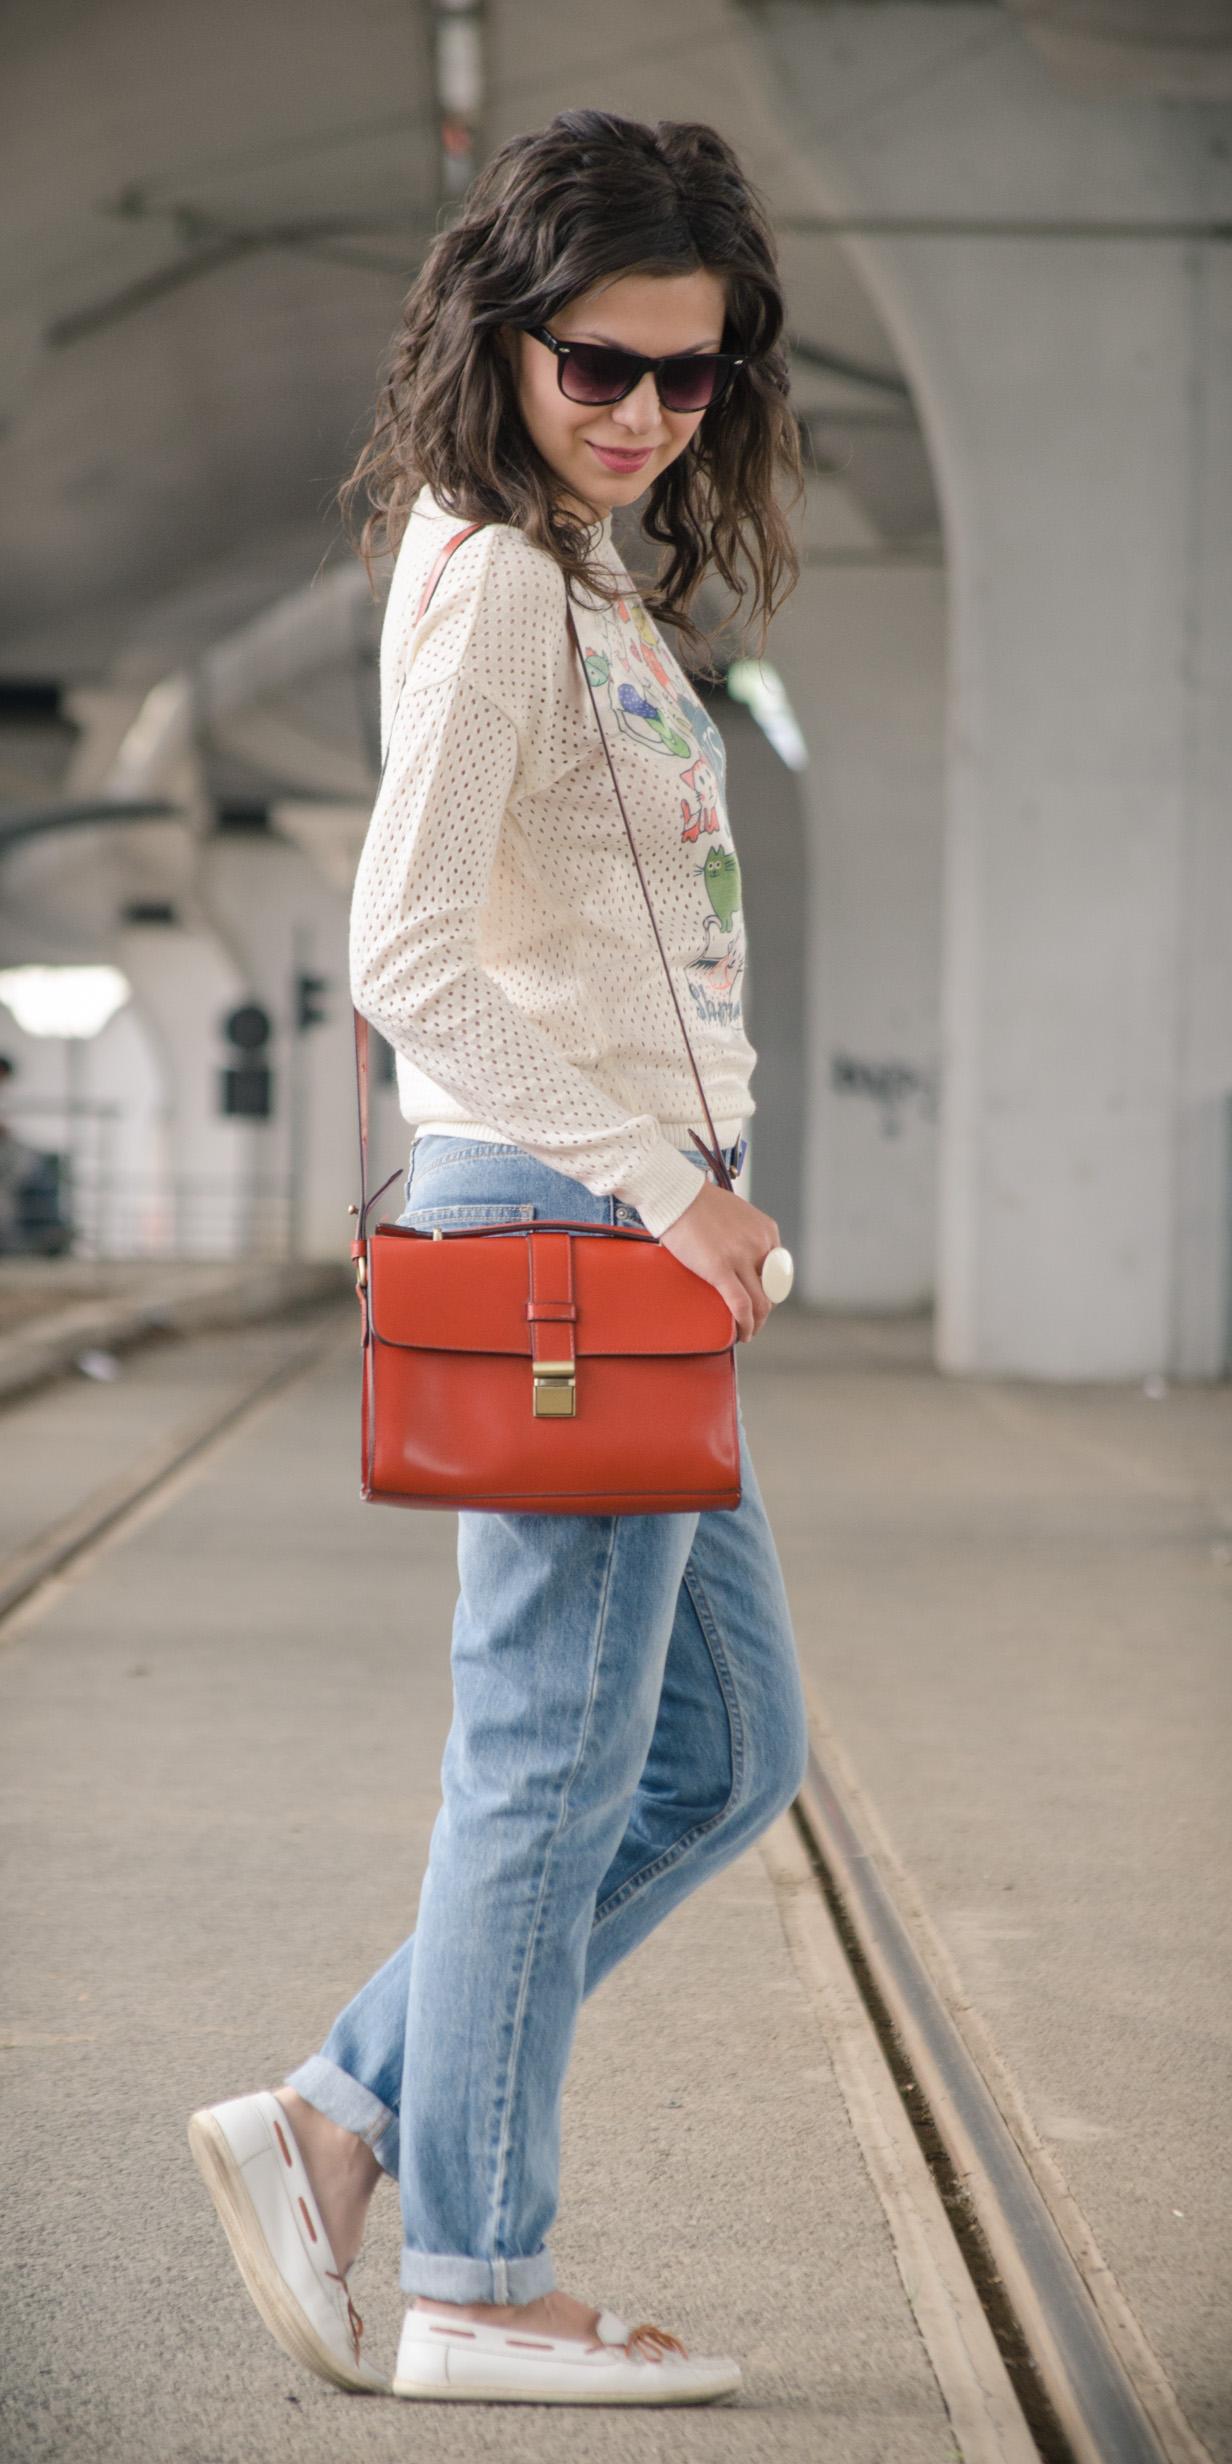 boyfriend jeans sweater cats orange bag satchel the bag shop h&m white loafers  casual